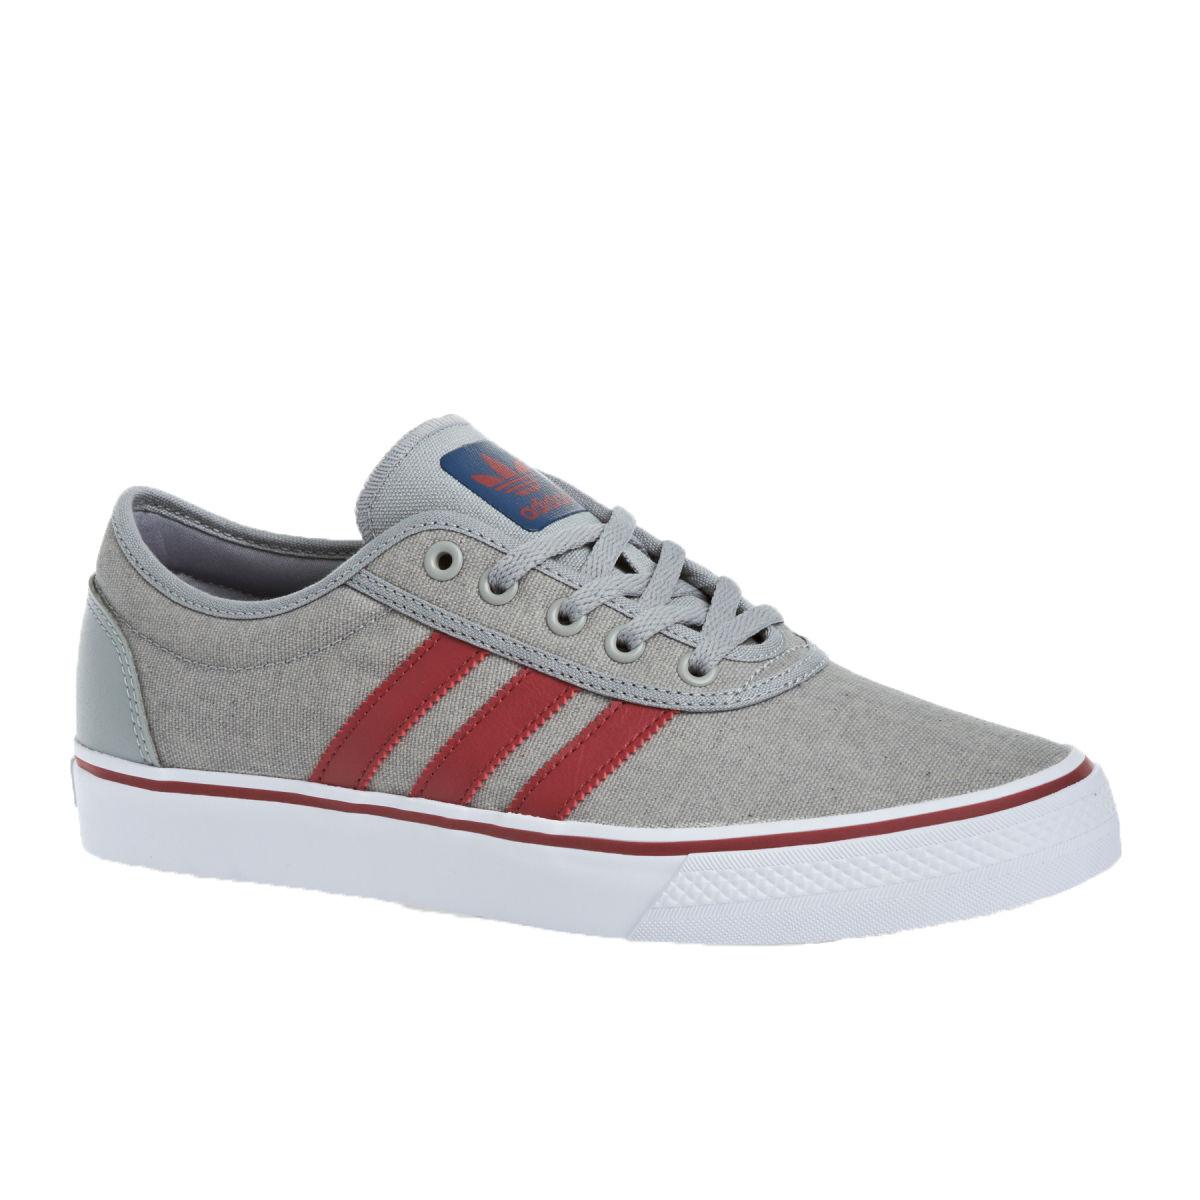 Adidas dga - met met met in pietra grigia con lo skateboard g98101 nomade rosso (237) scarpe da uomo 726b1c